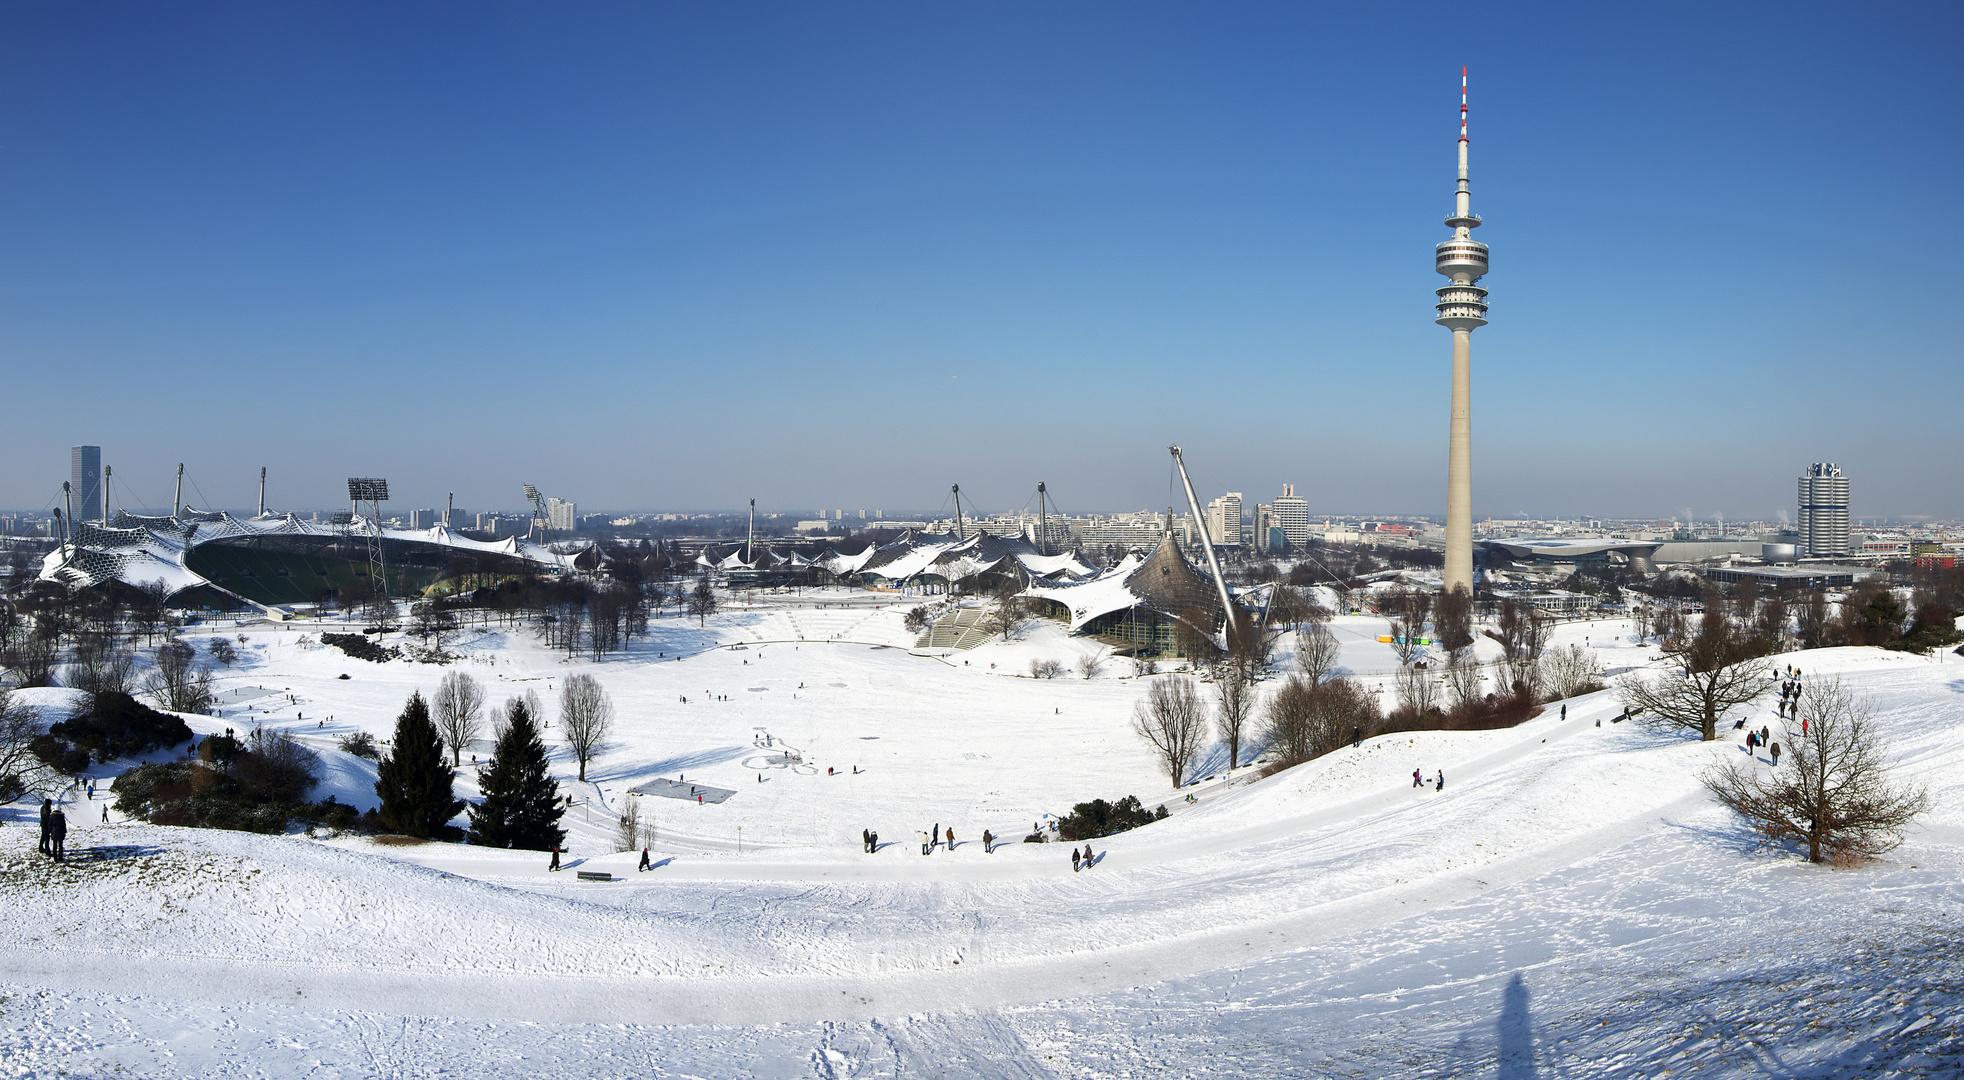 Winter im Olympiapark München .....